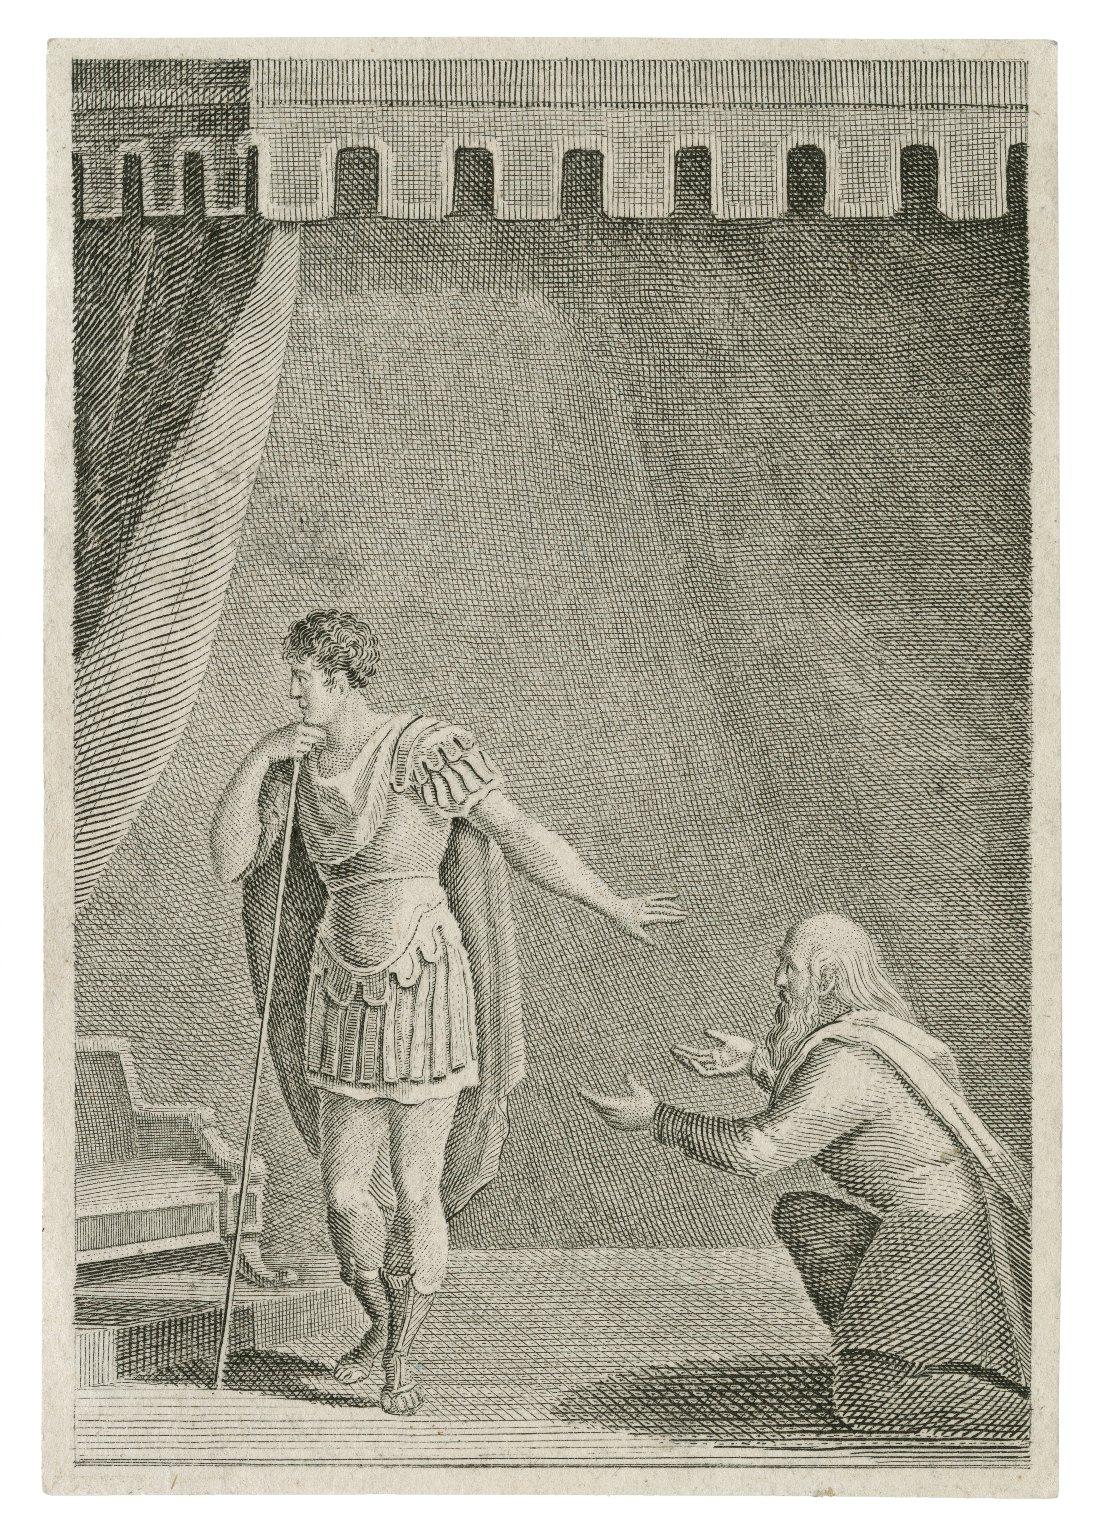 [Coriolanus, possibly act V, scene 3, illustrating lines 8-15] [graphic].